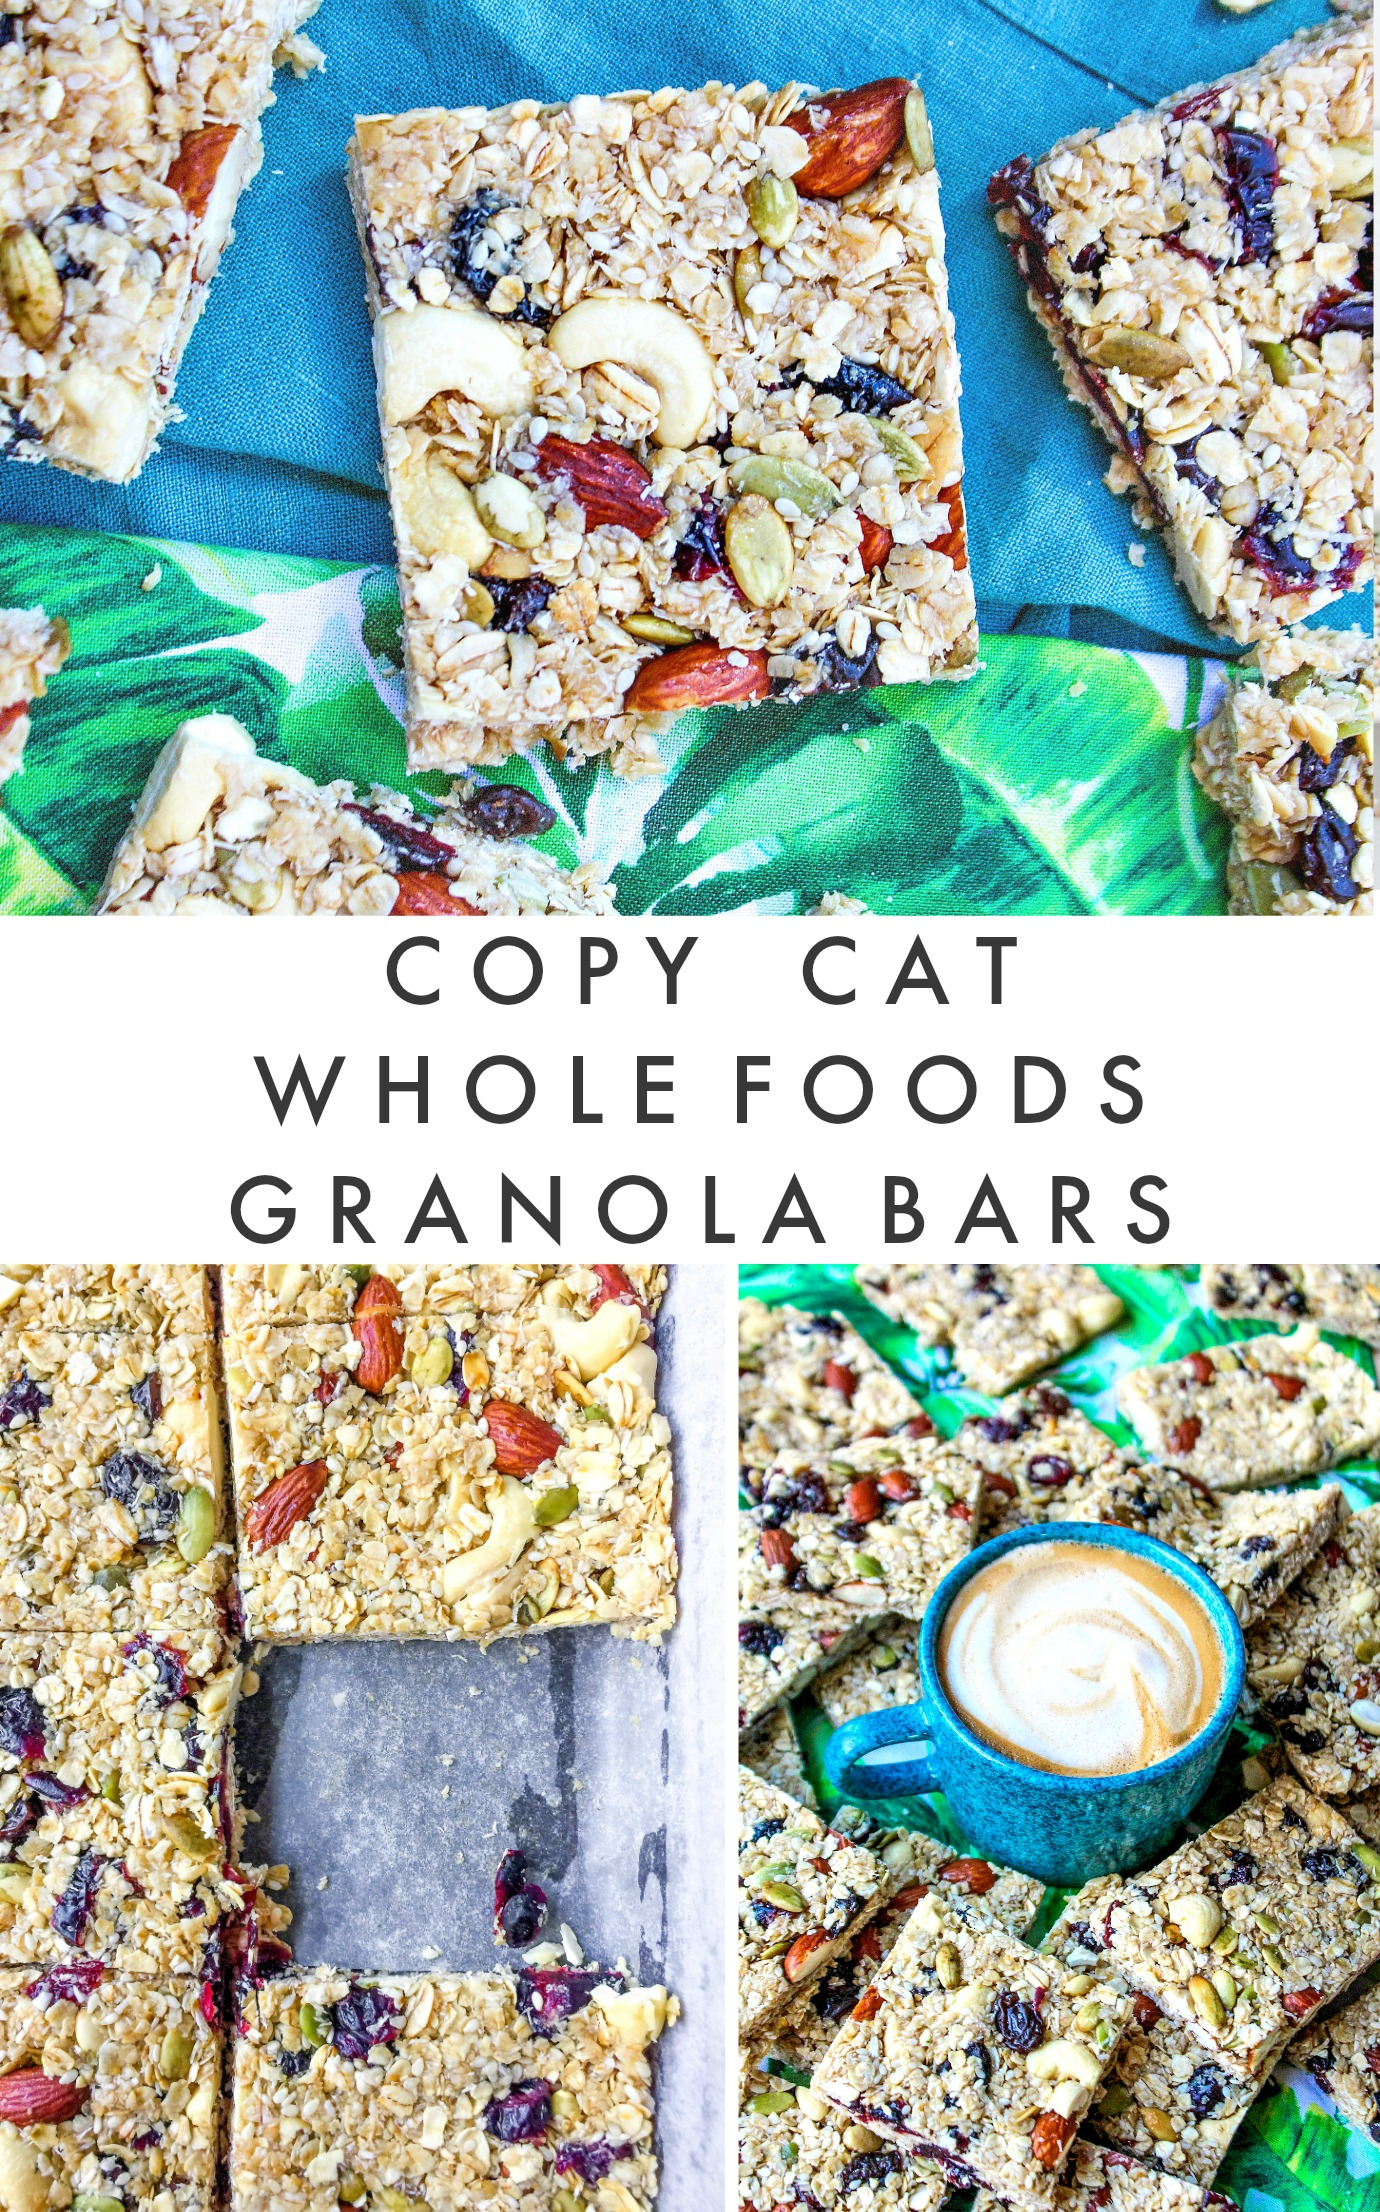 Copycat Homemade Whole Food S Granola Bar Recipe Simply Taralynn Food Lifestyle Blog